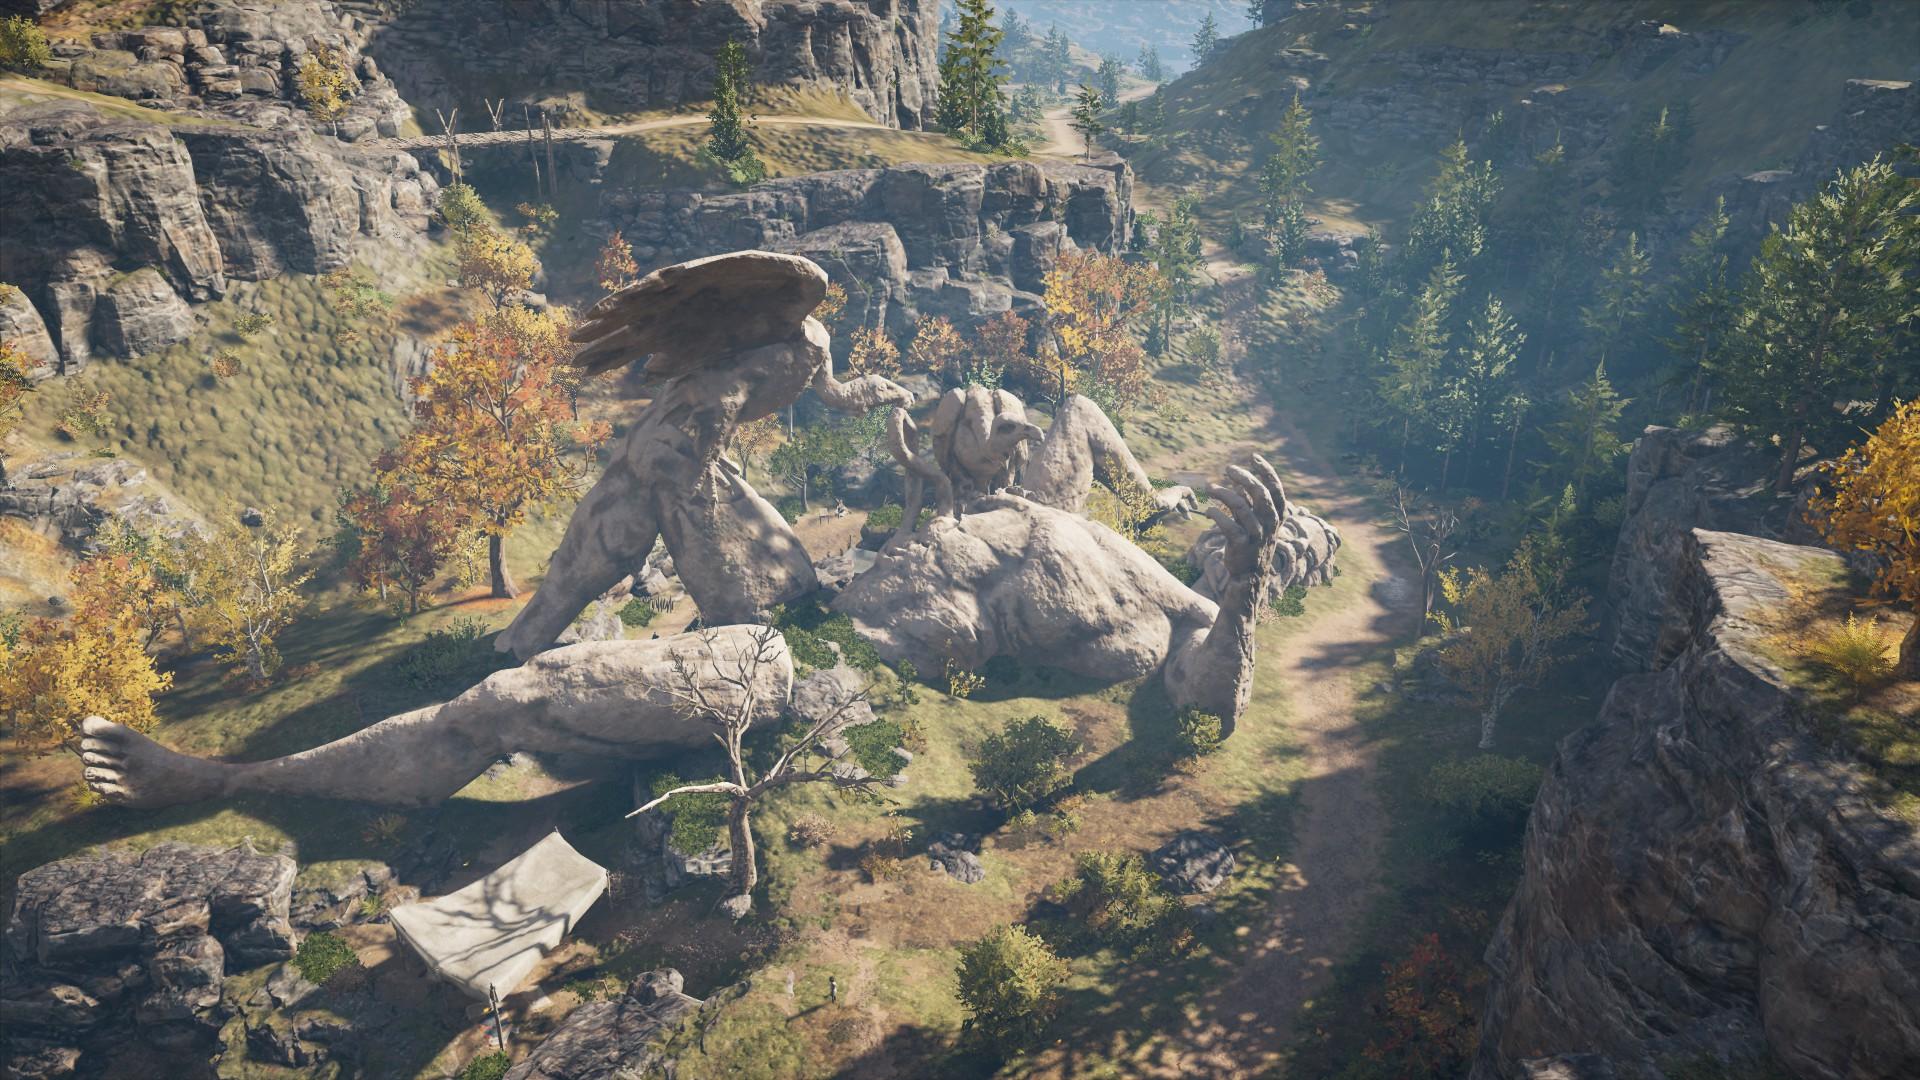 20181030015219_1.jpg - Assassin's Creed: Odyssey